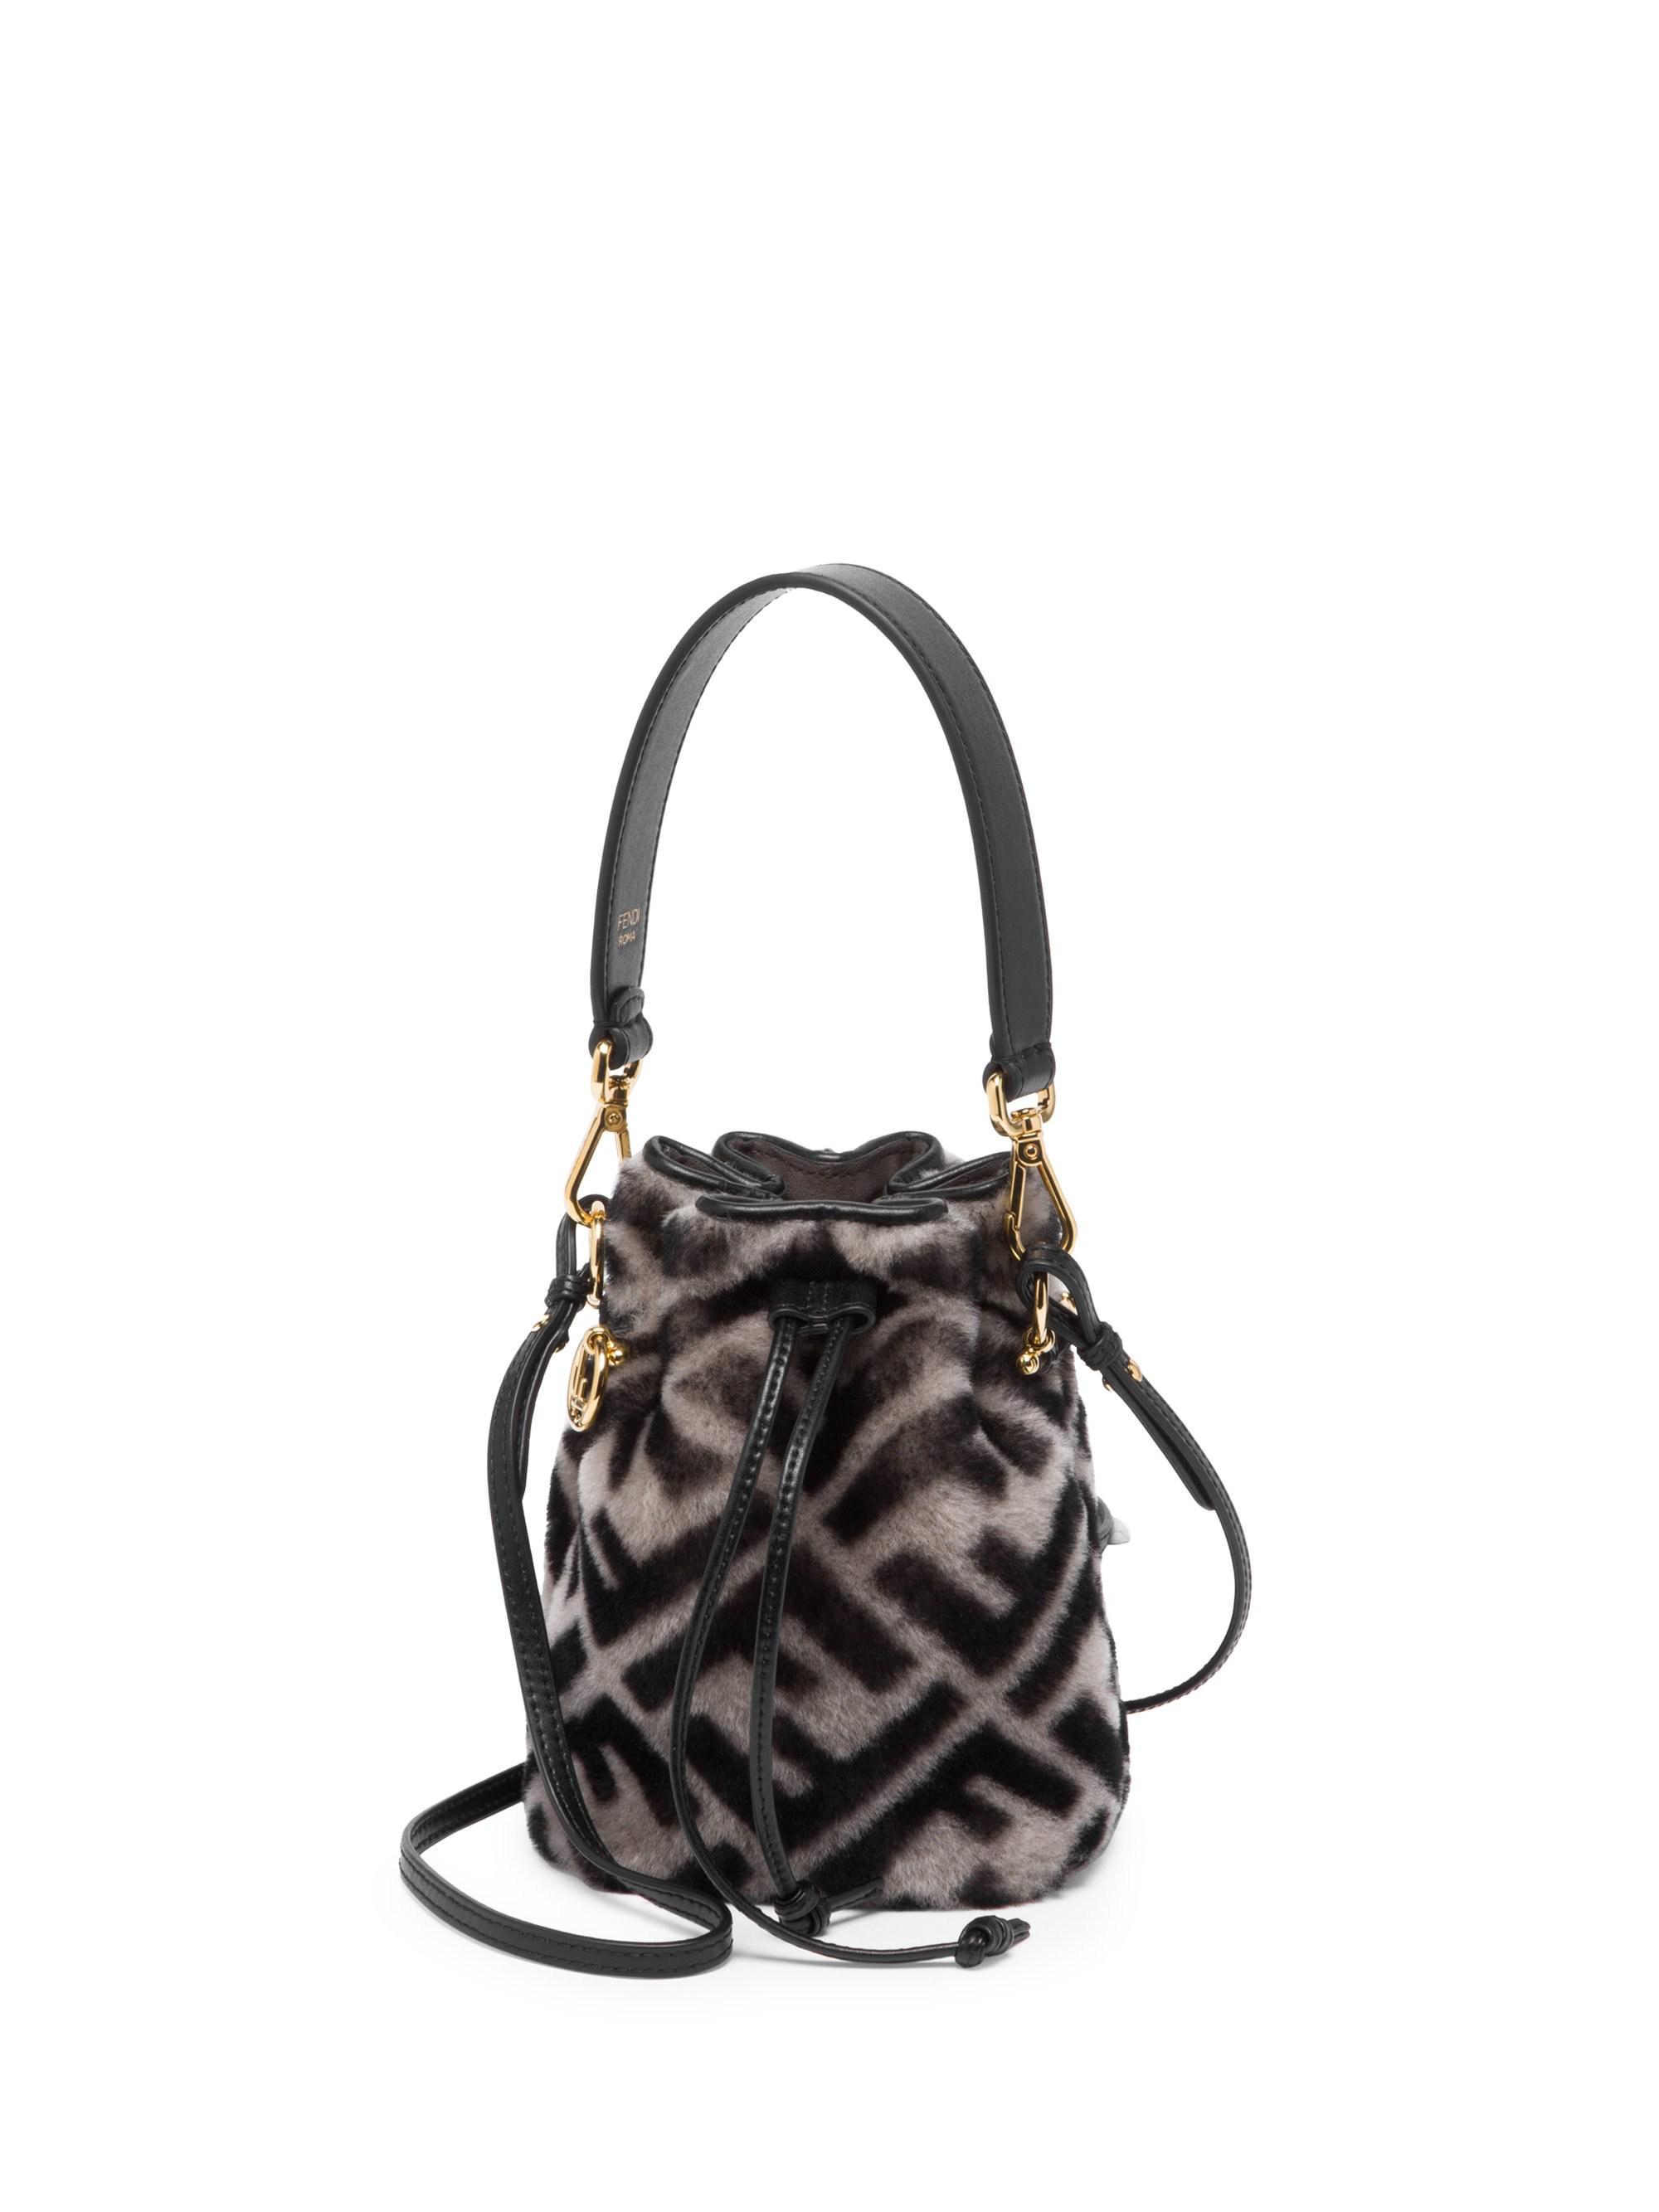 0887e35daba3 Fendi Mini Mon Tresor Shearling Bucket Bag in Black - Lyst